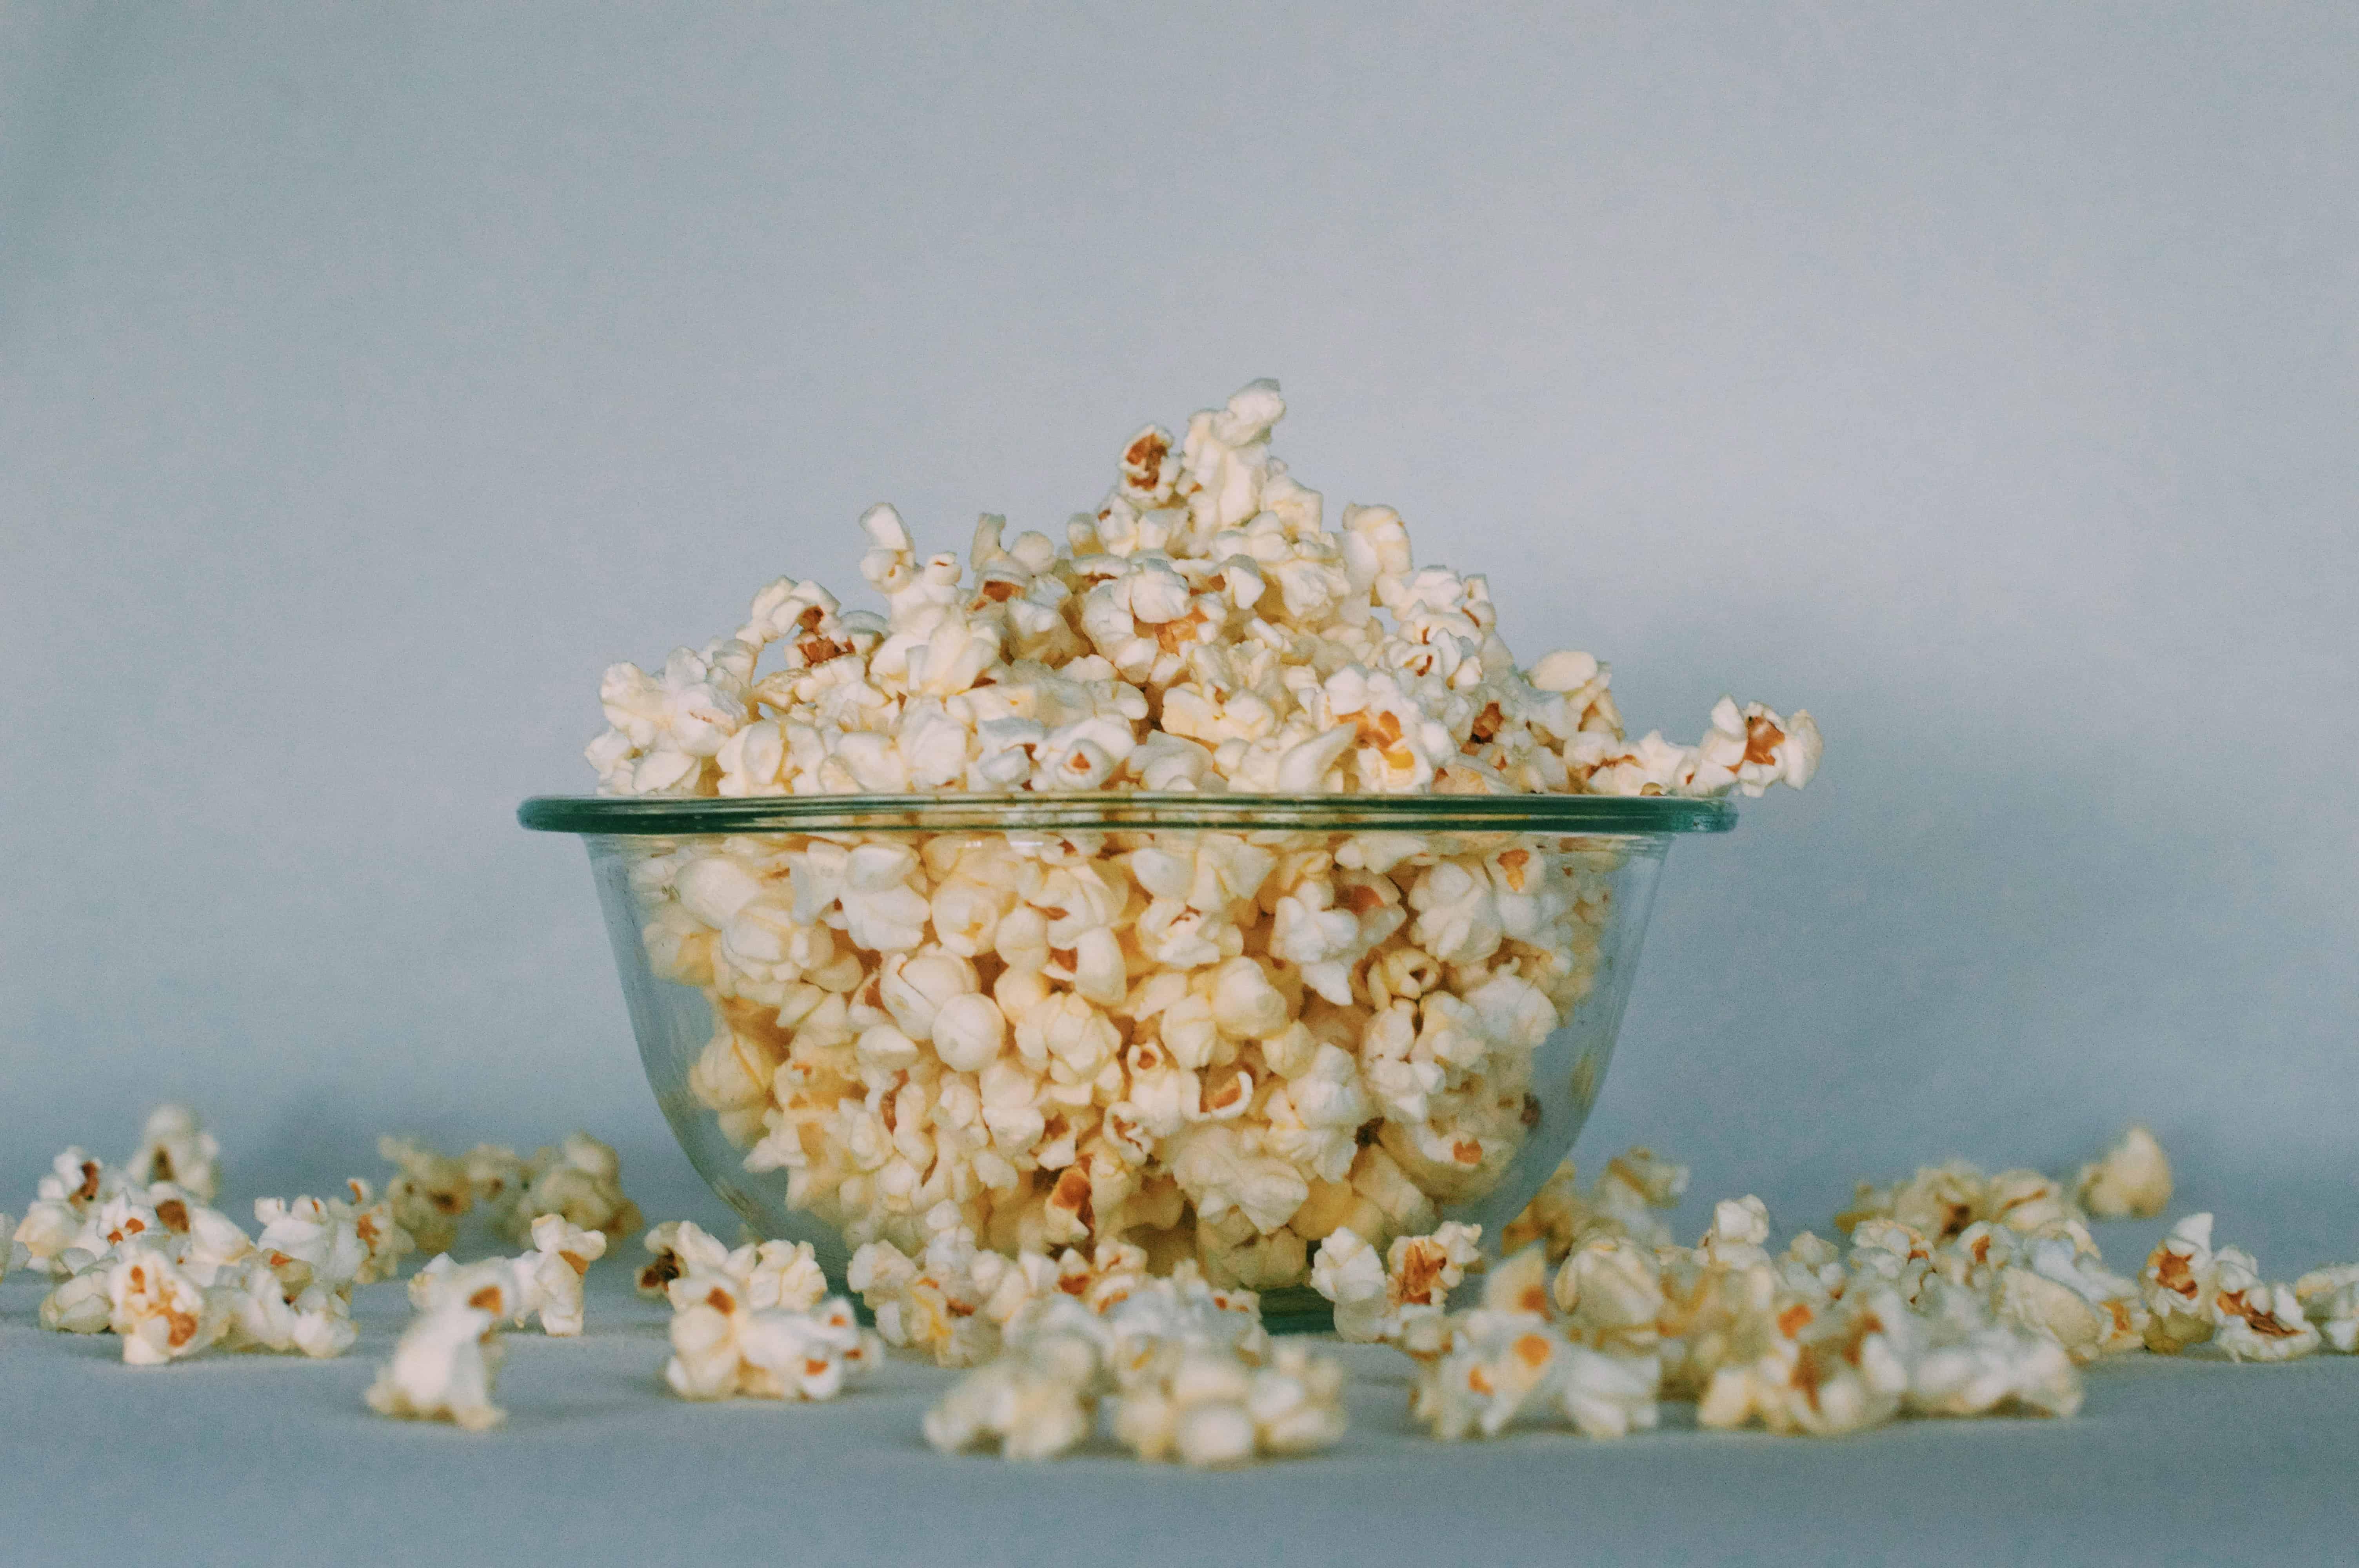 bowl of popcorn, corn facts